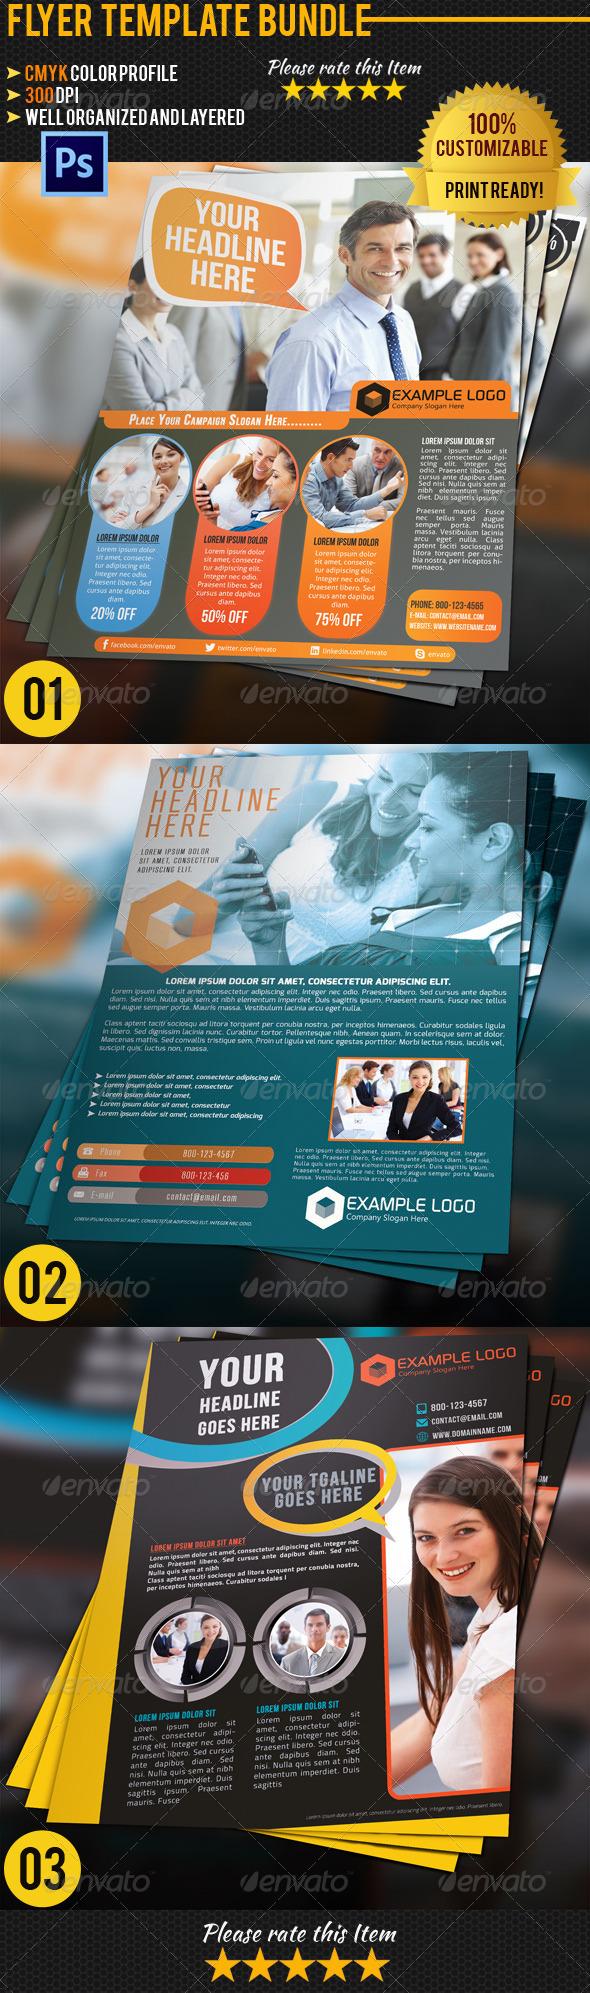 Corporate Business Flyer Bundle 02 - Corporate Flyers